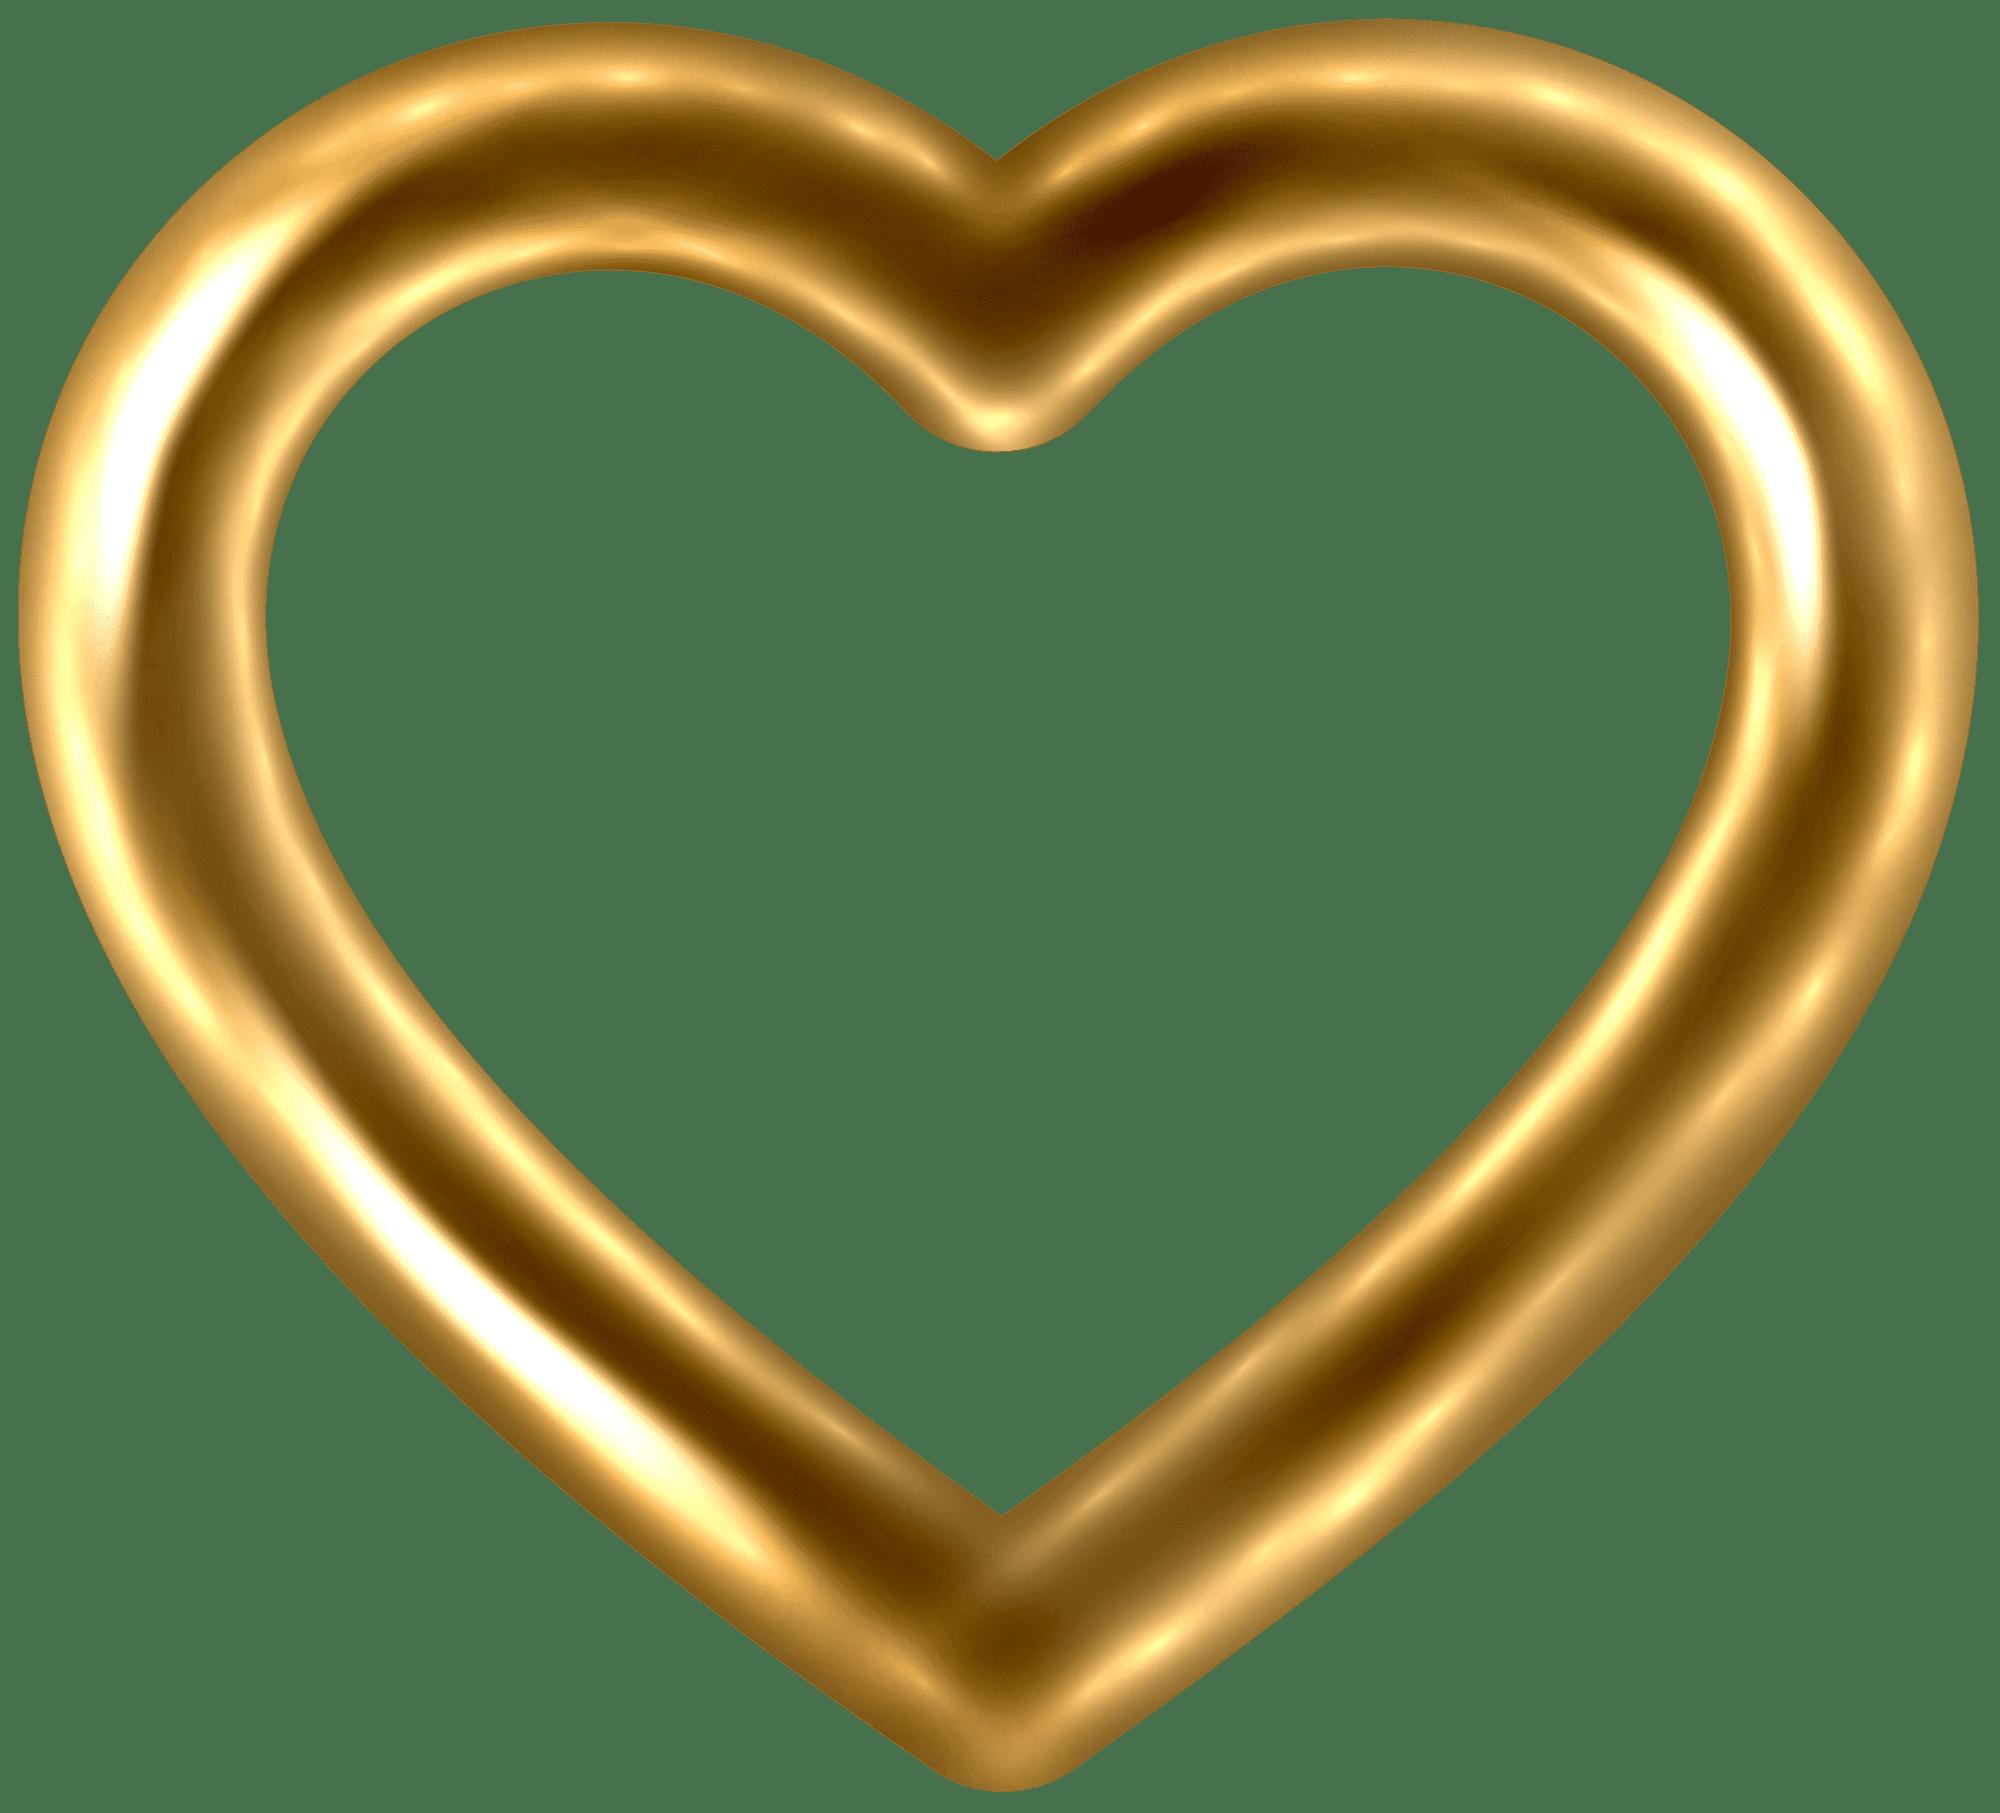 Transparent Gold Heart PNG Clip Art Image